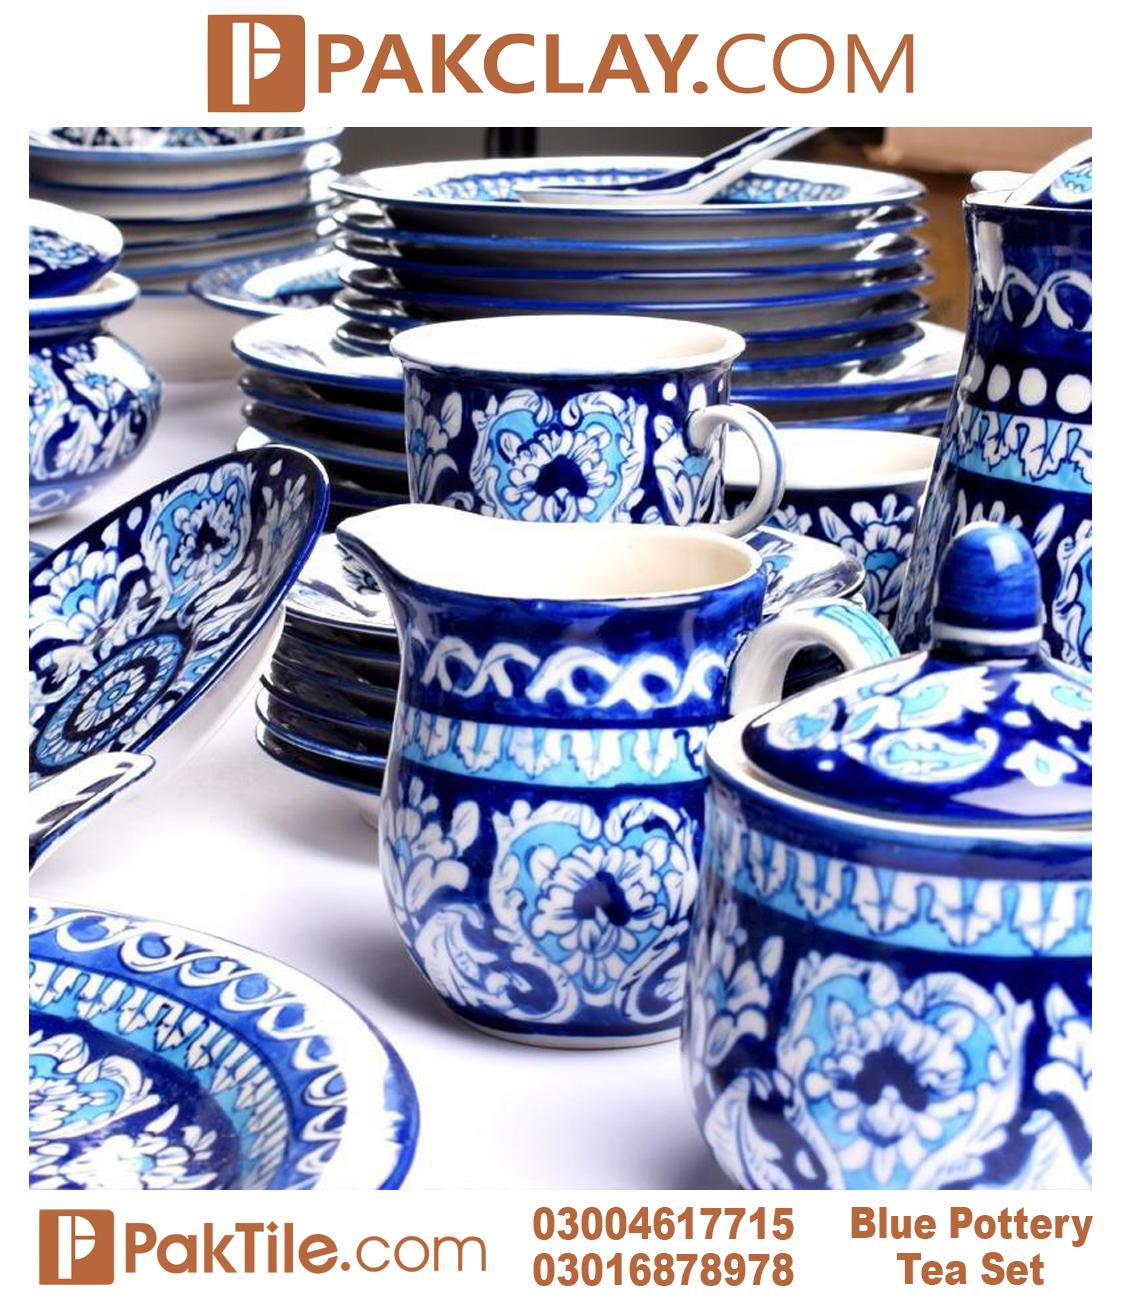 2 Multani Blue Pottery Tea Set in Karachi